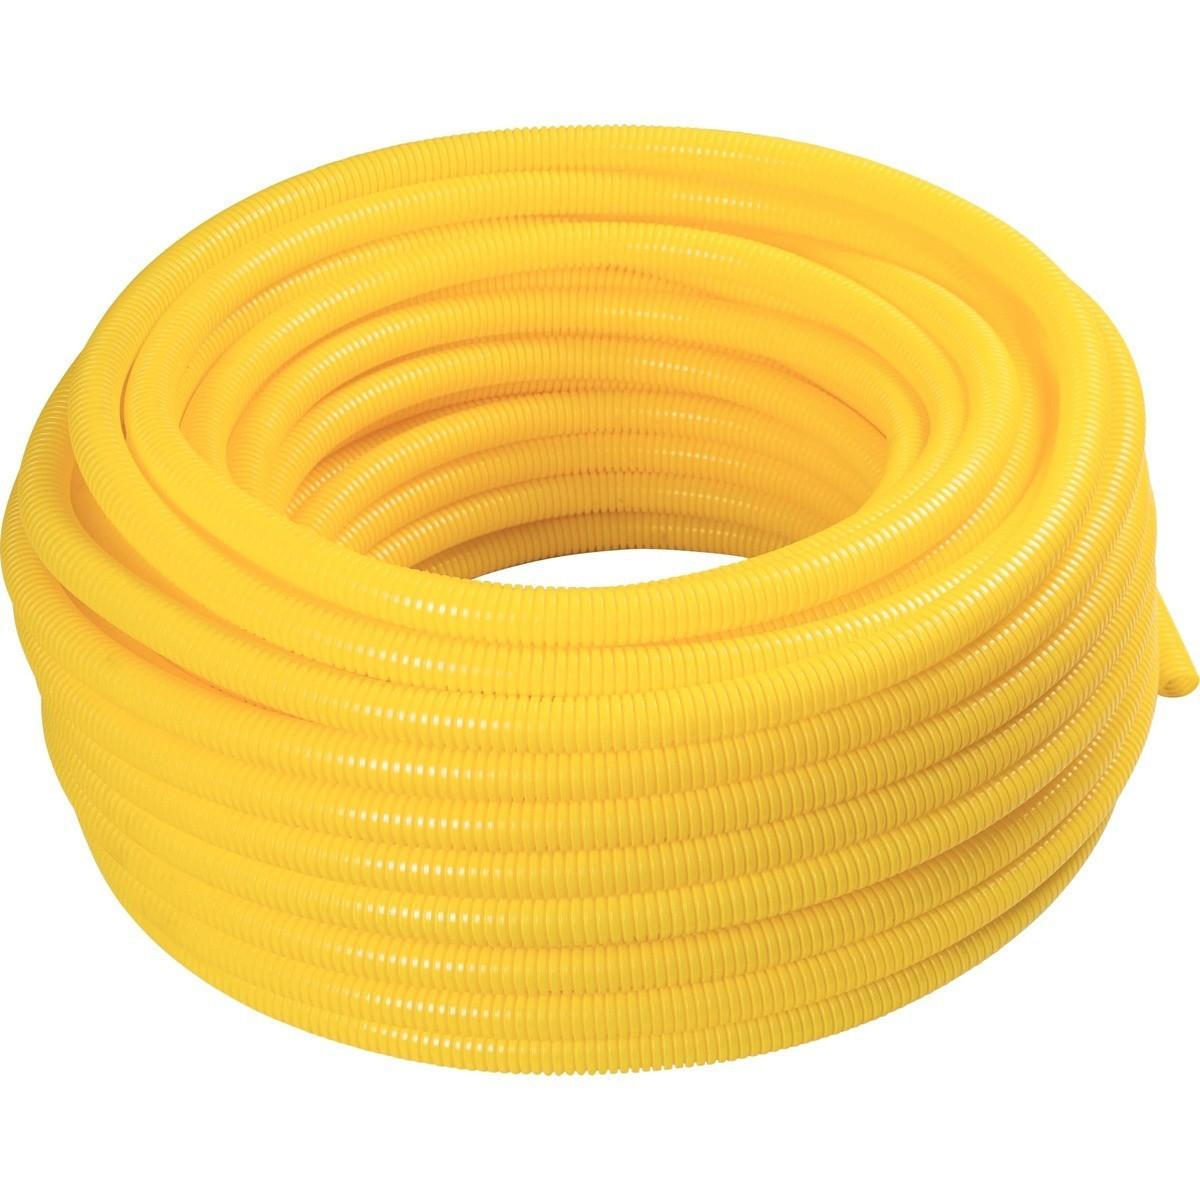 Eletroduto Flexivel Corrugado PVC DN 20 mm 12 x 50m - Tramontina